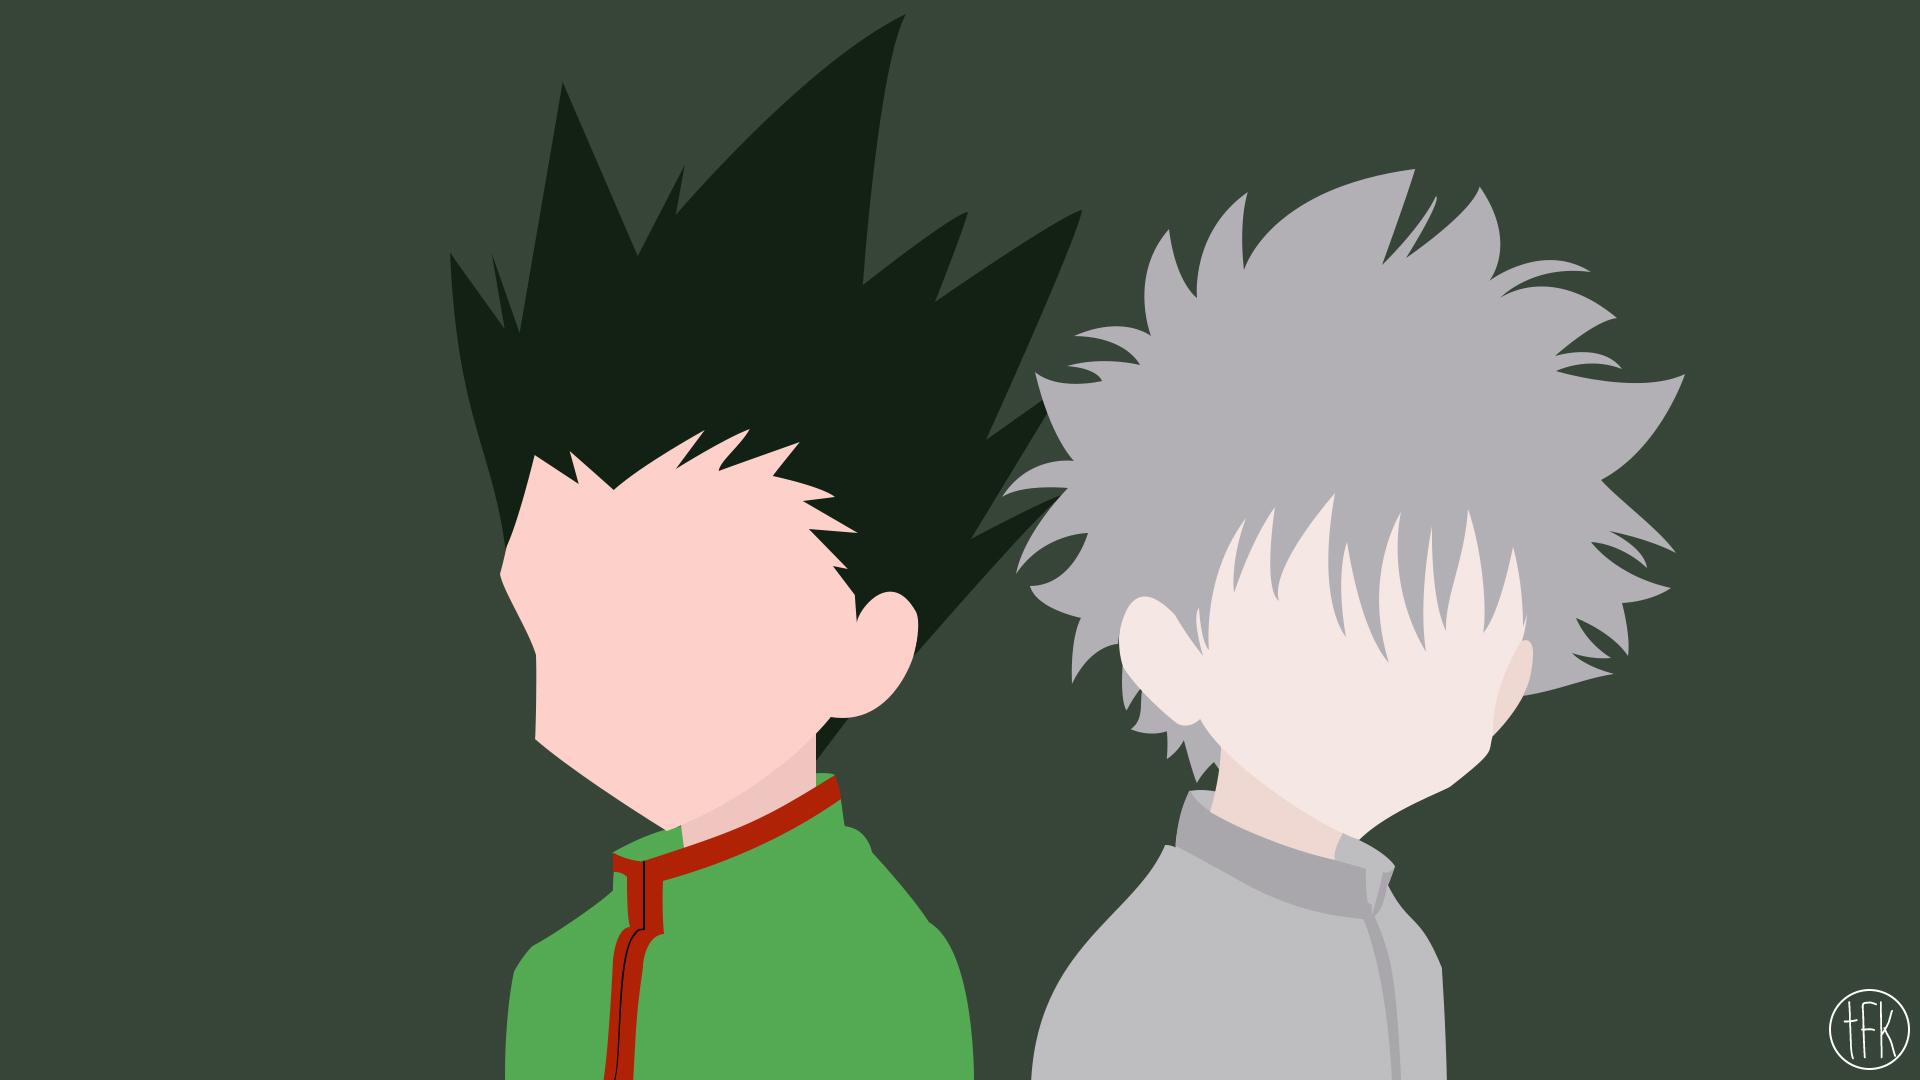 Hd wallpaper anime hunter x hunter gon freecss killua. Hunter x Hunter Gon And Killua 2 HD Anime Wallpapers | HD ...